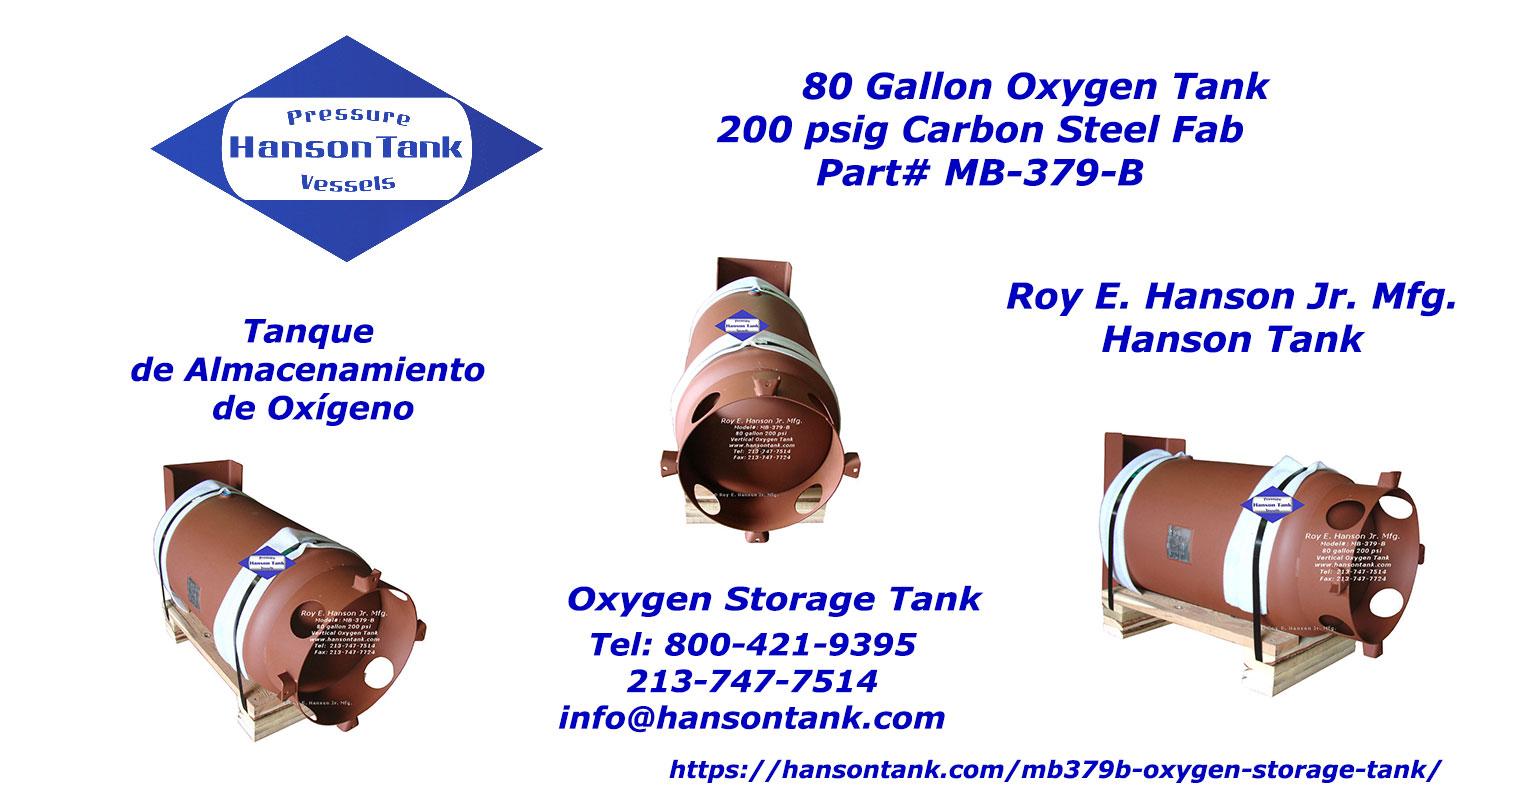 oxygen-storage-tanks-mb379b-1528x800 - Hanson Tank Asme Code